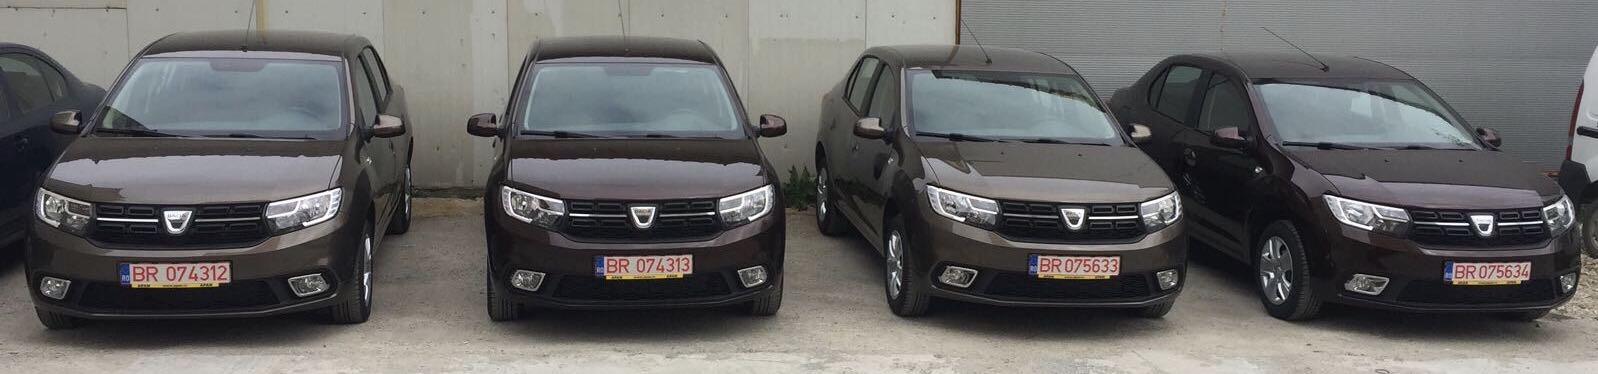 Inchirieri Auto Dacia Logan Promotie